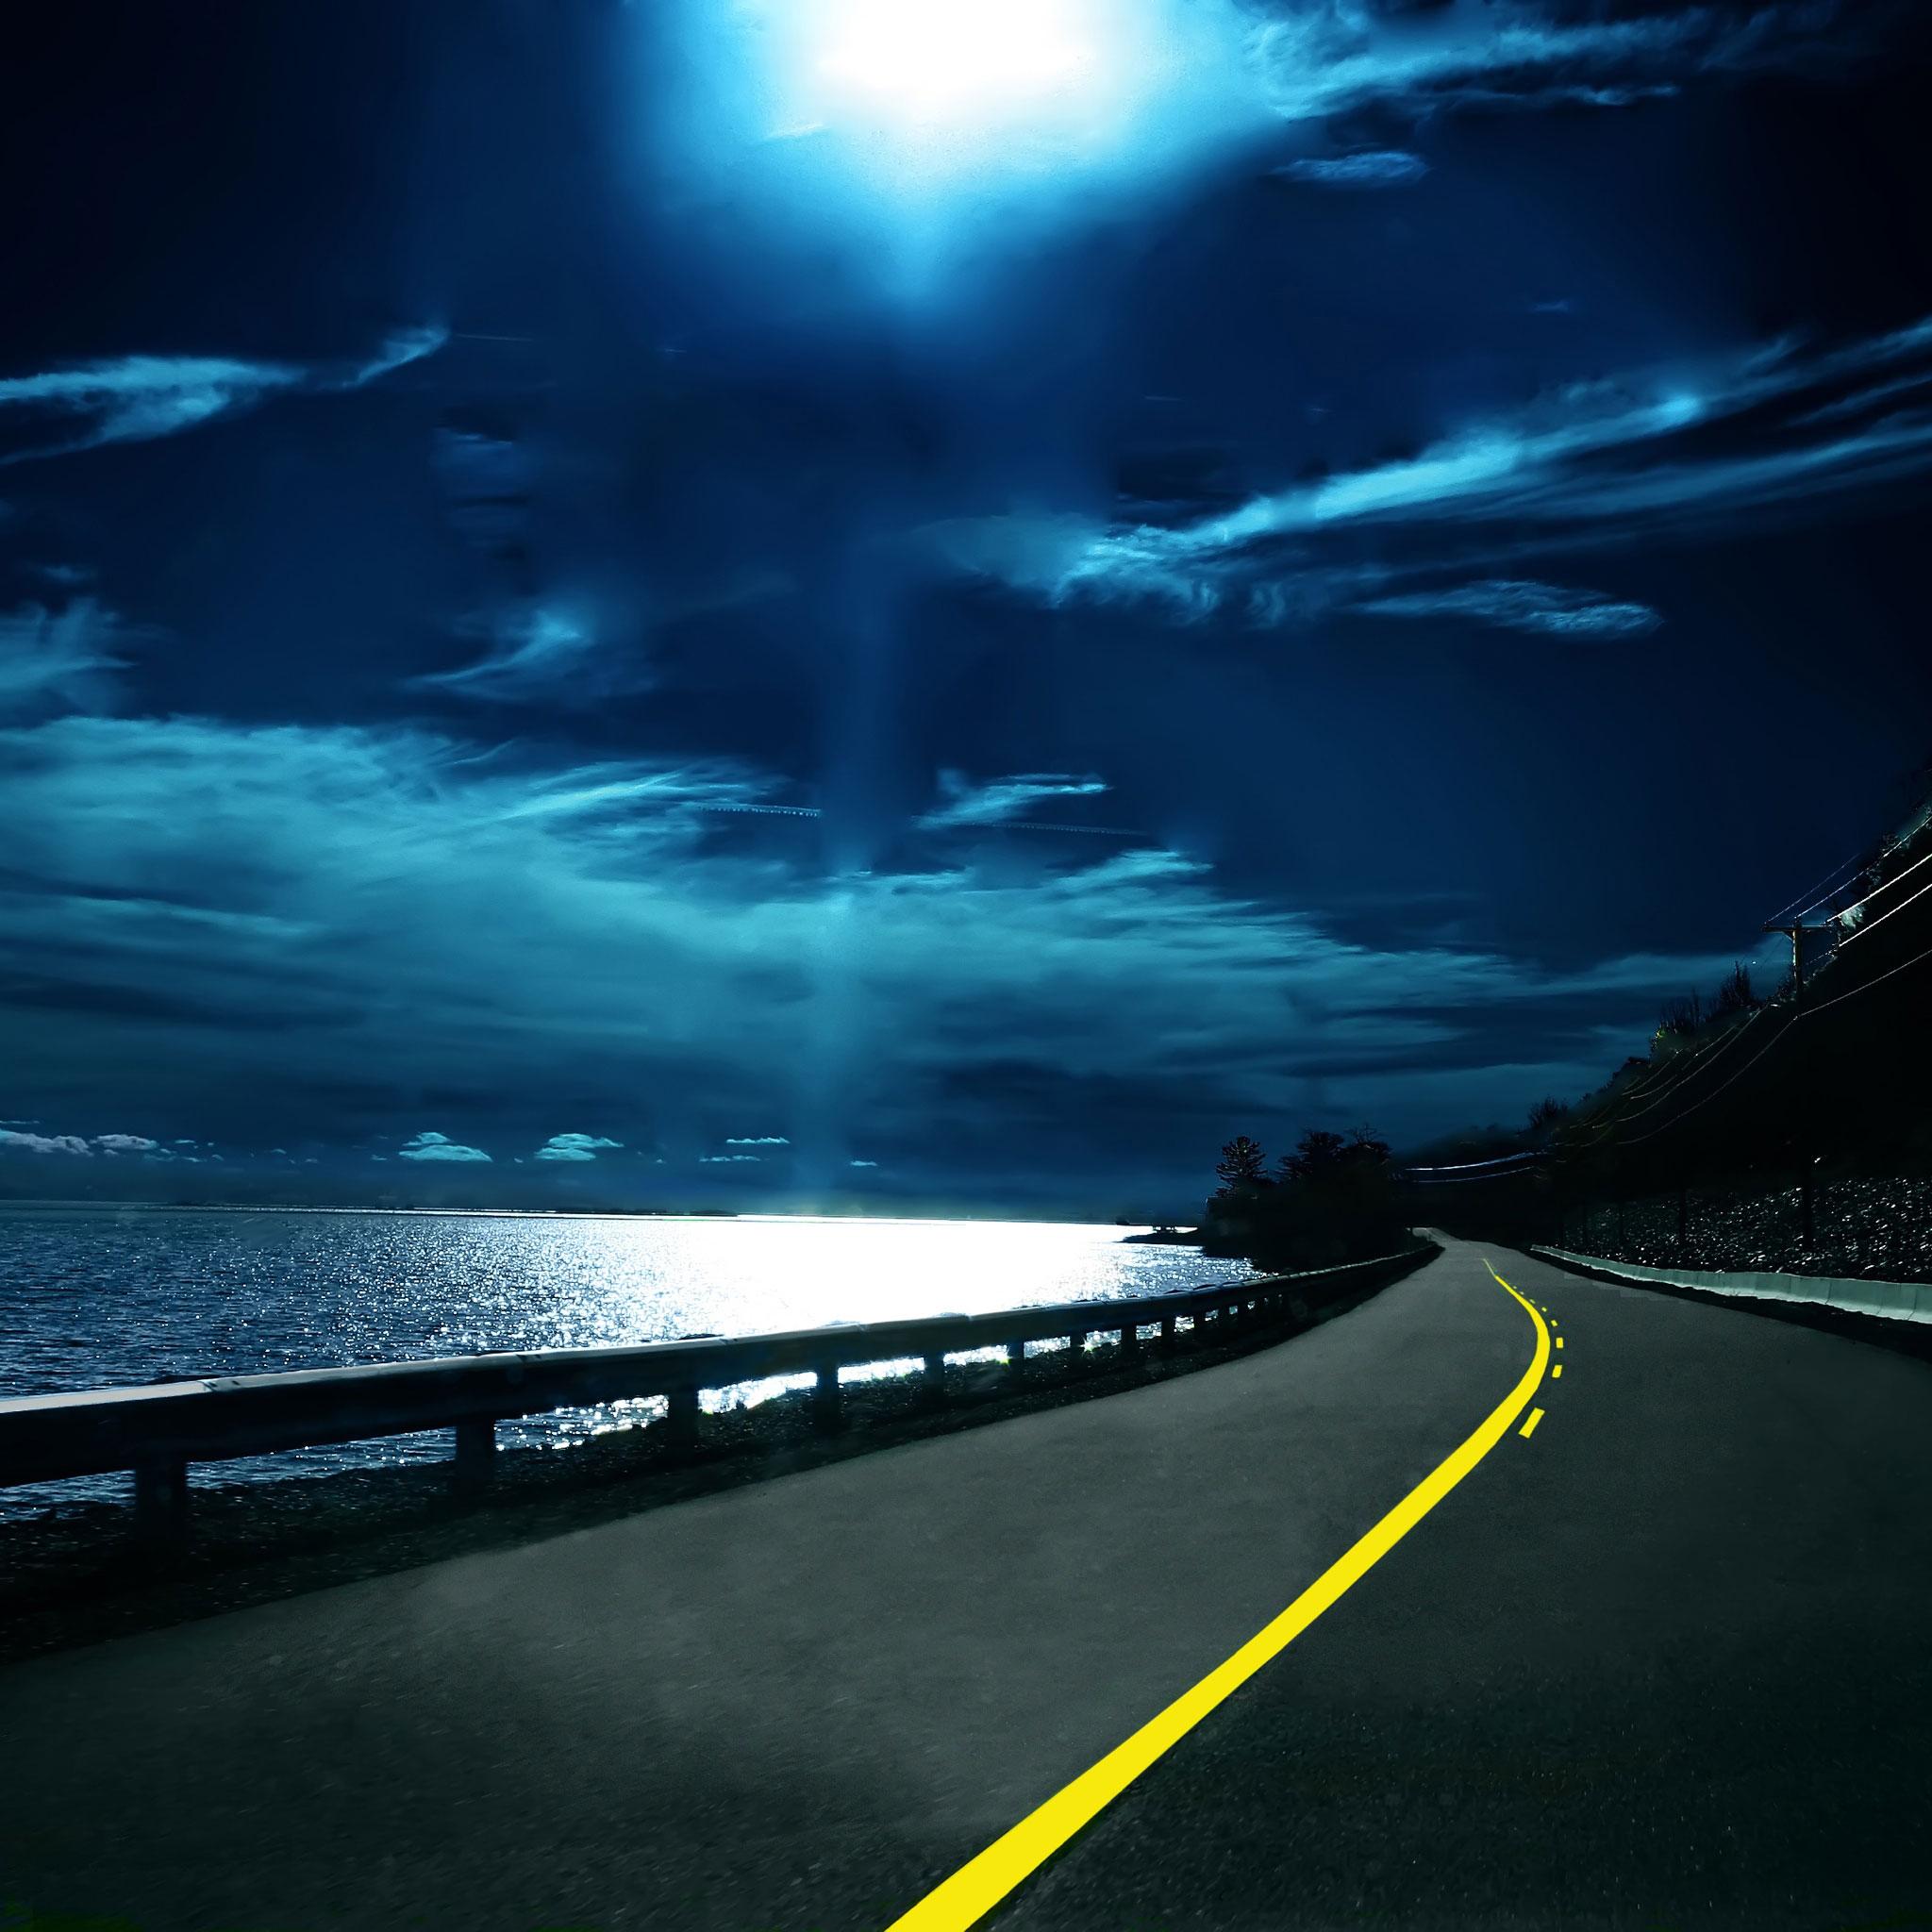 Highway-Nights-3Wallpapers-iPad-Retina